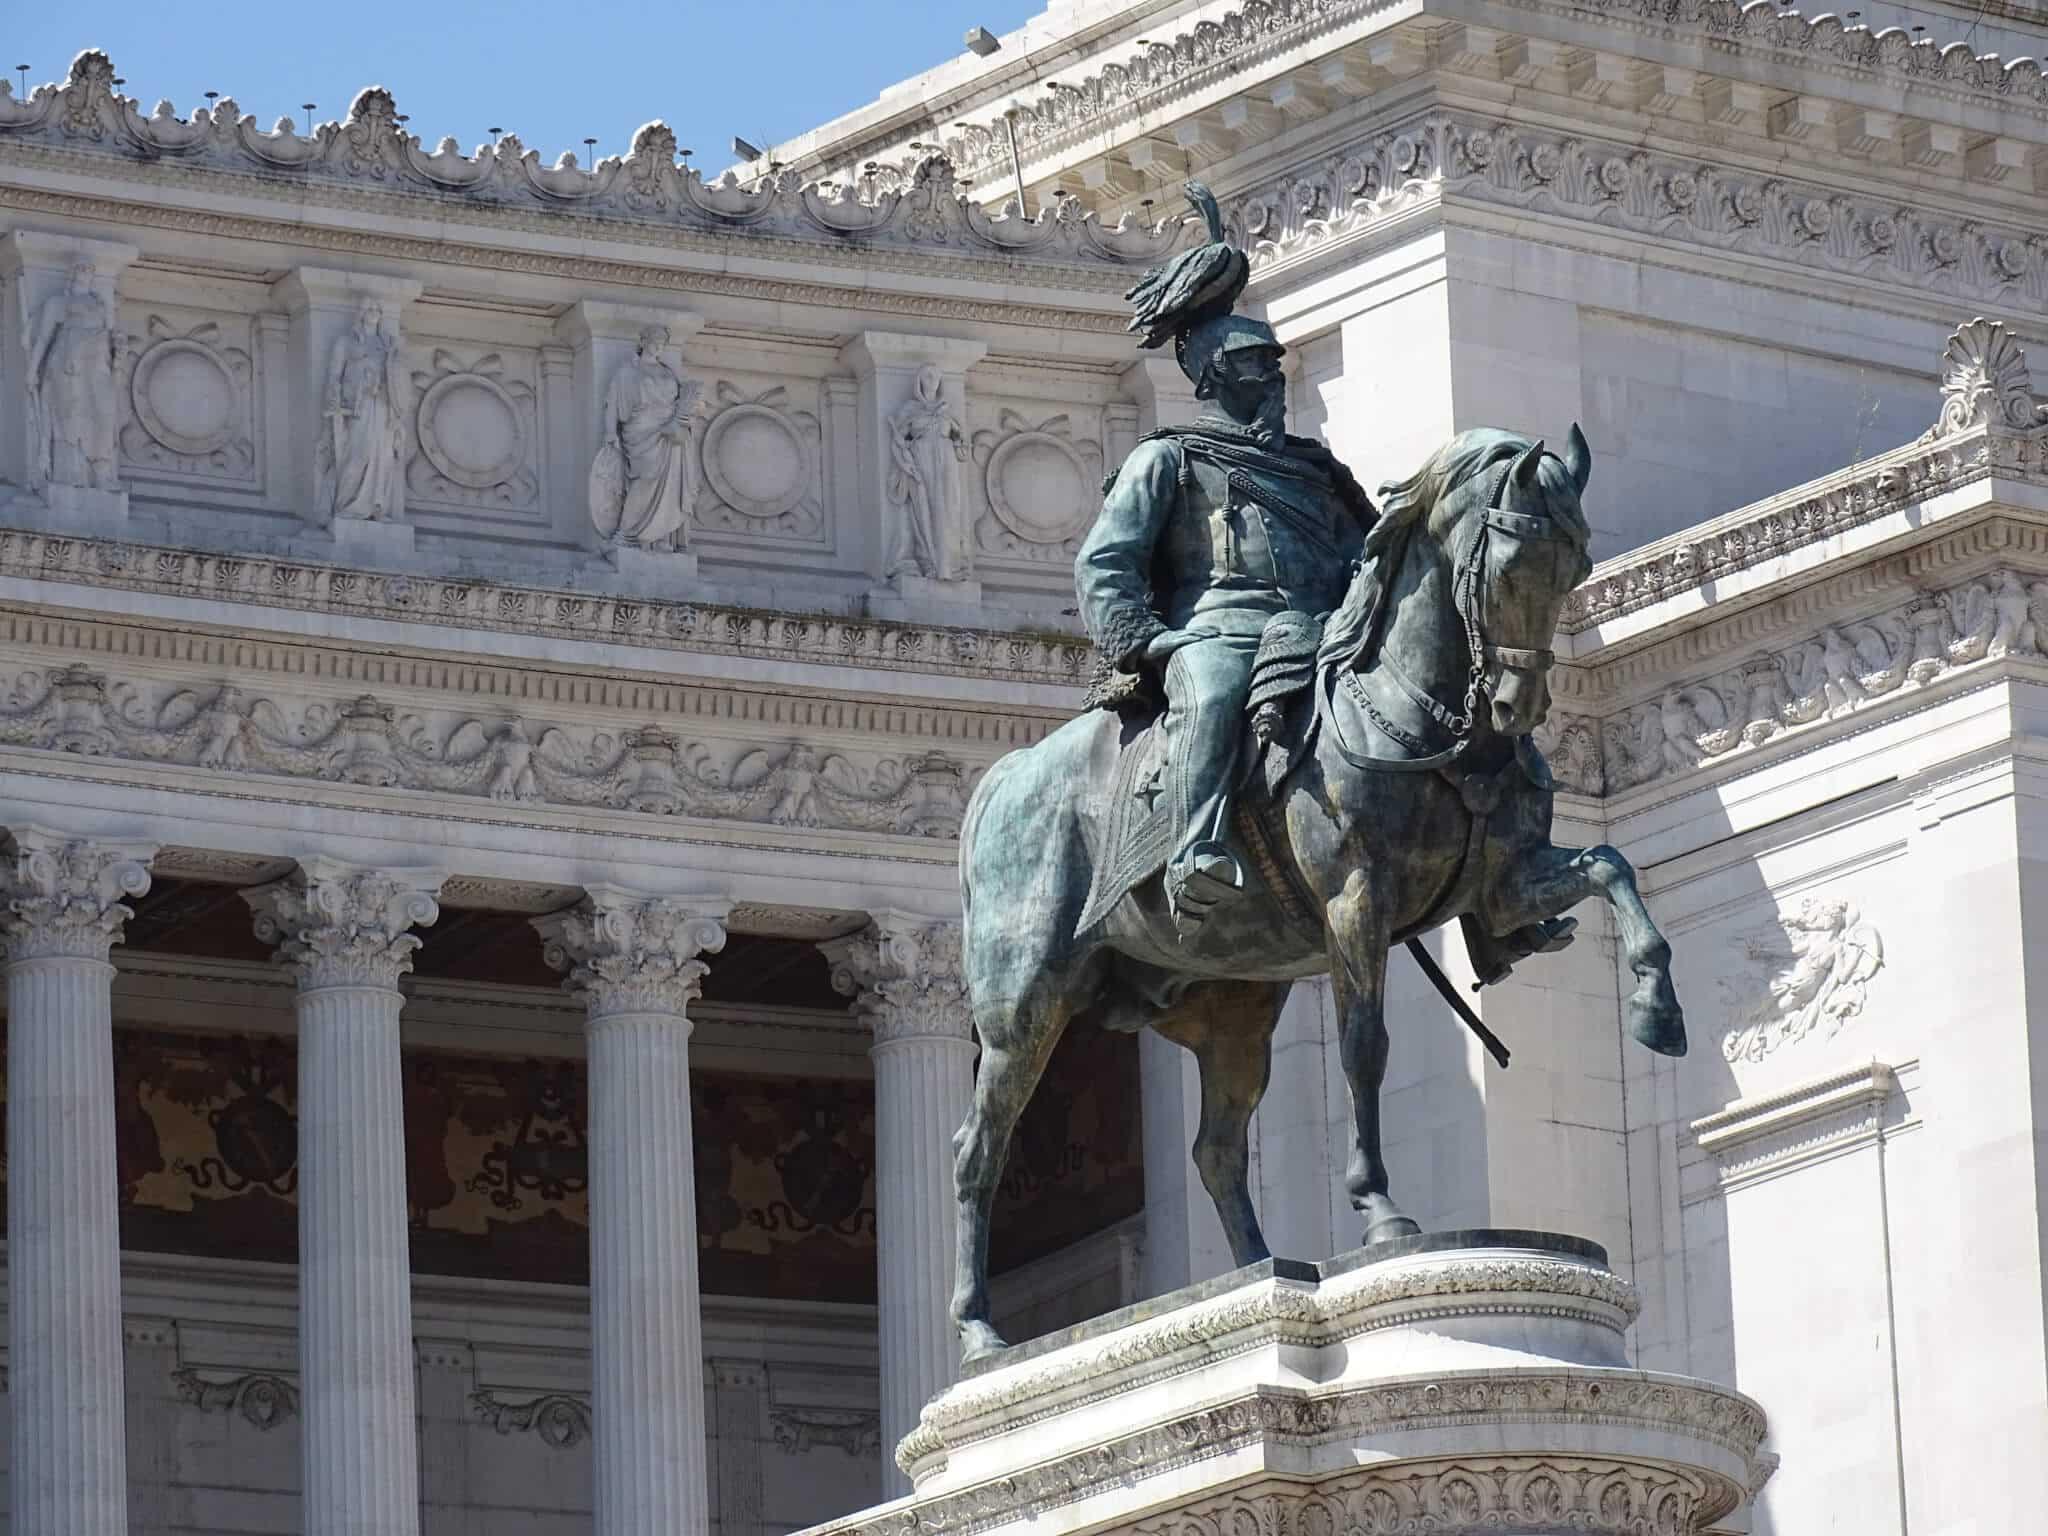 Piazza Venezia in Rome, Italy.